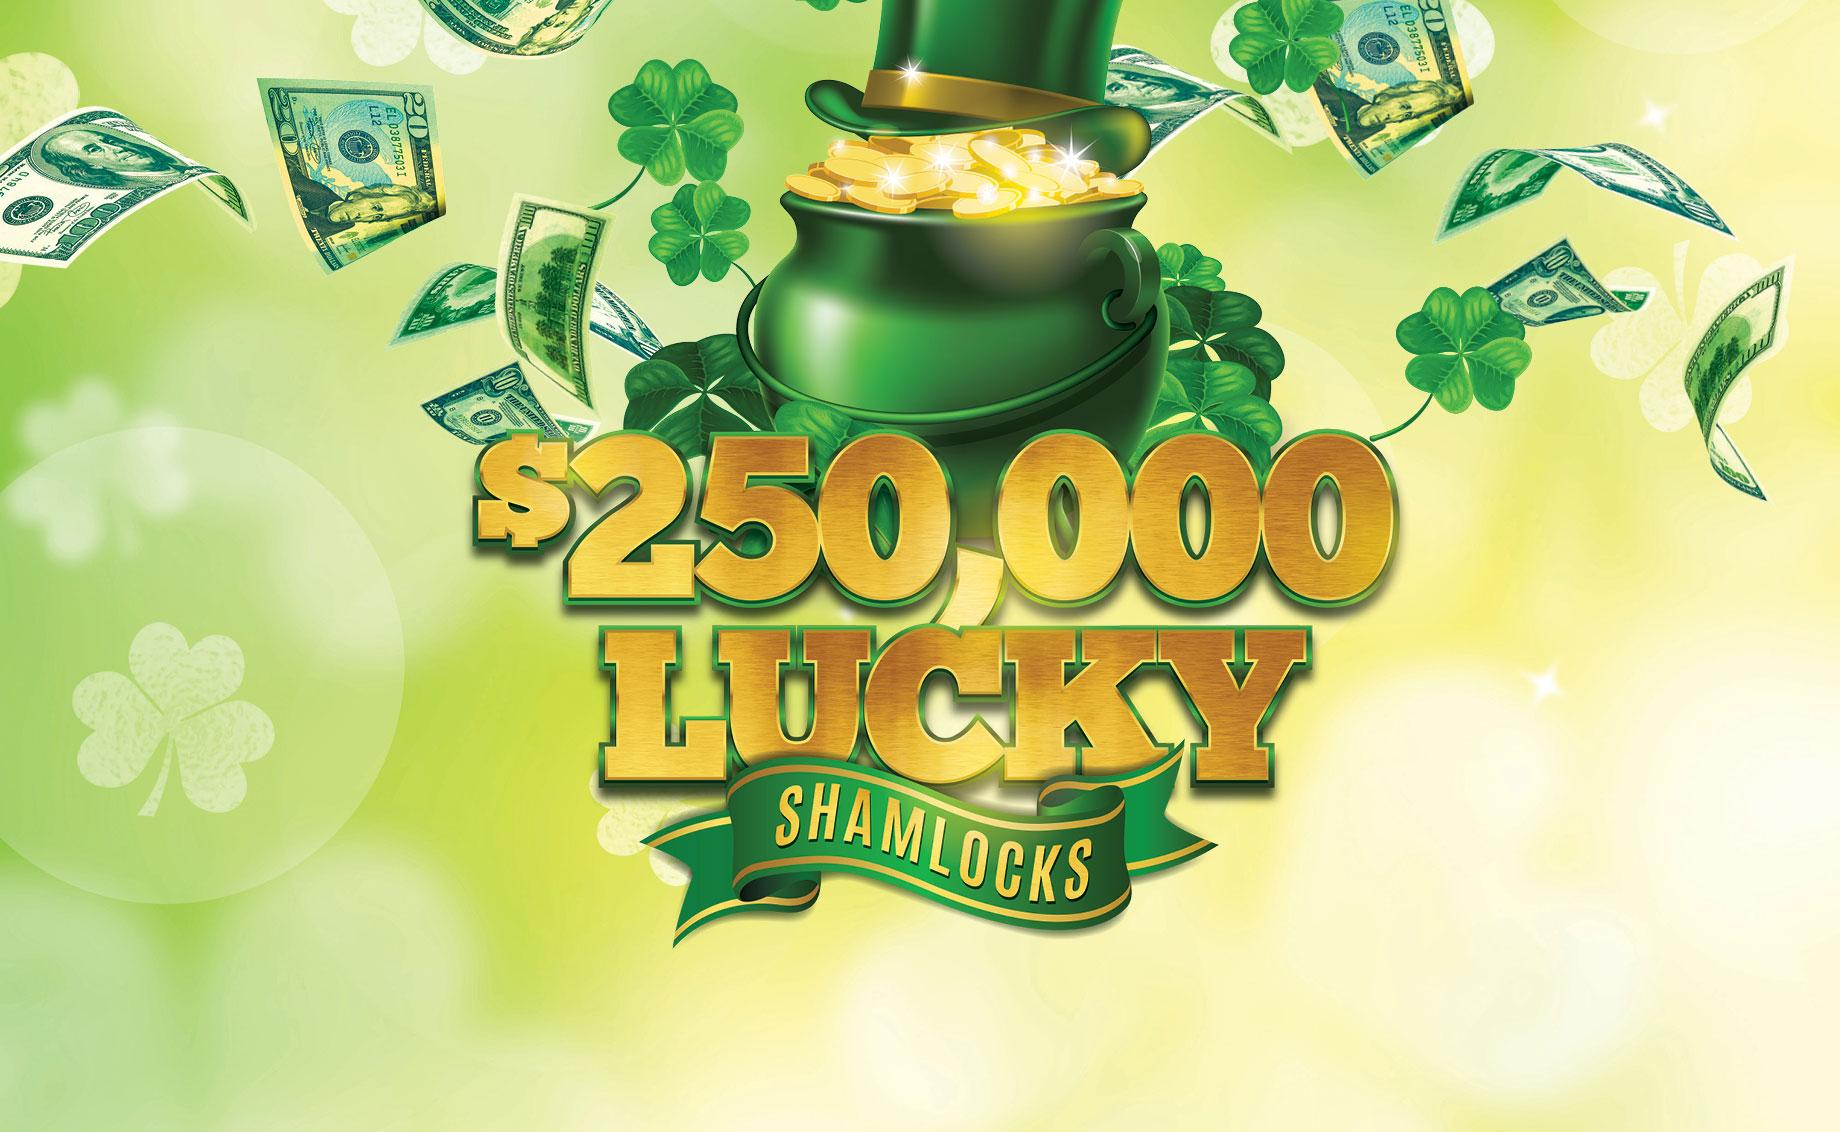 $250,000 Lucky Shamlocks